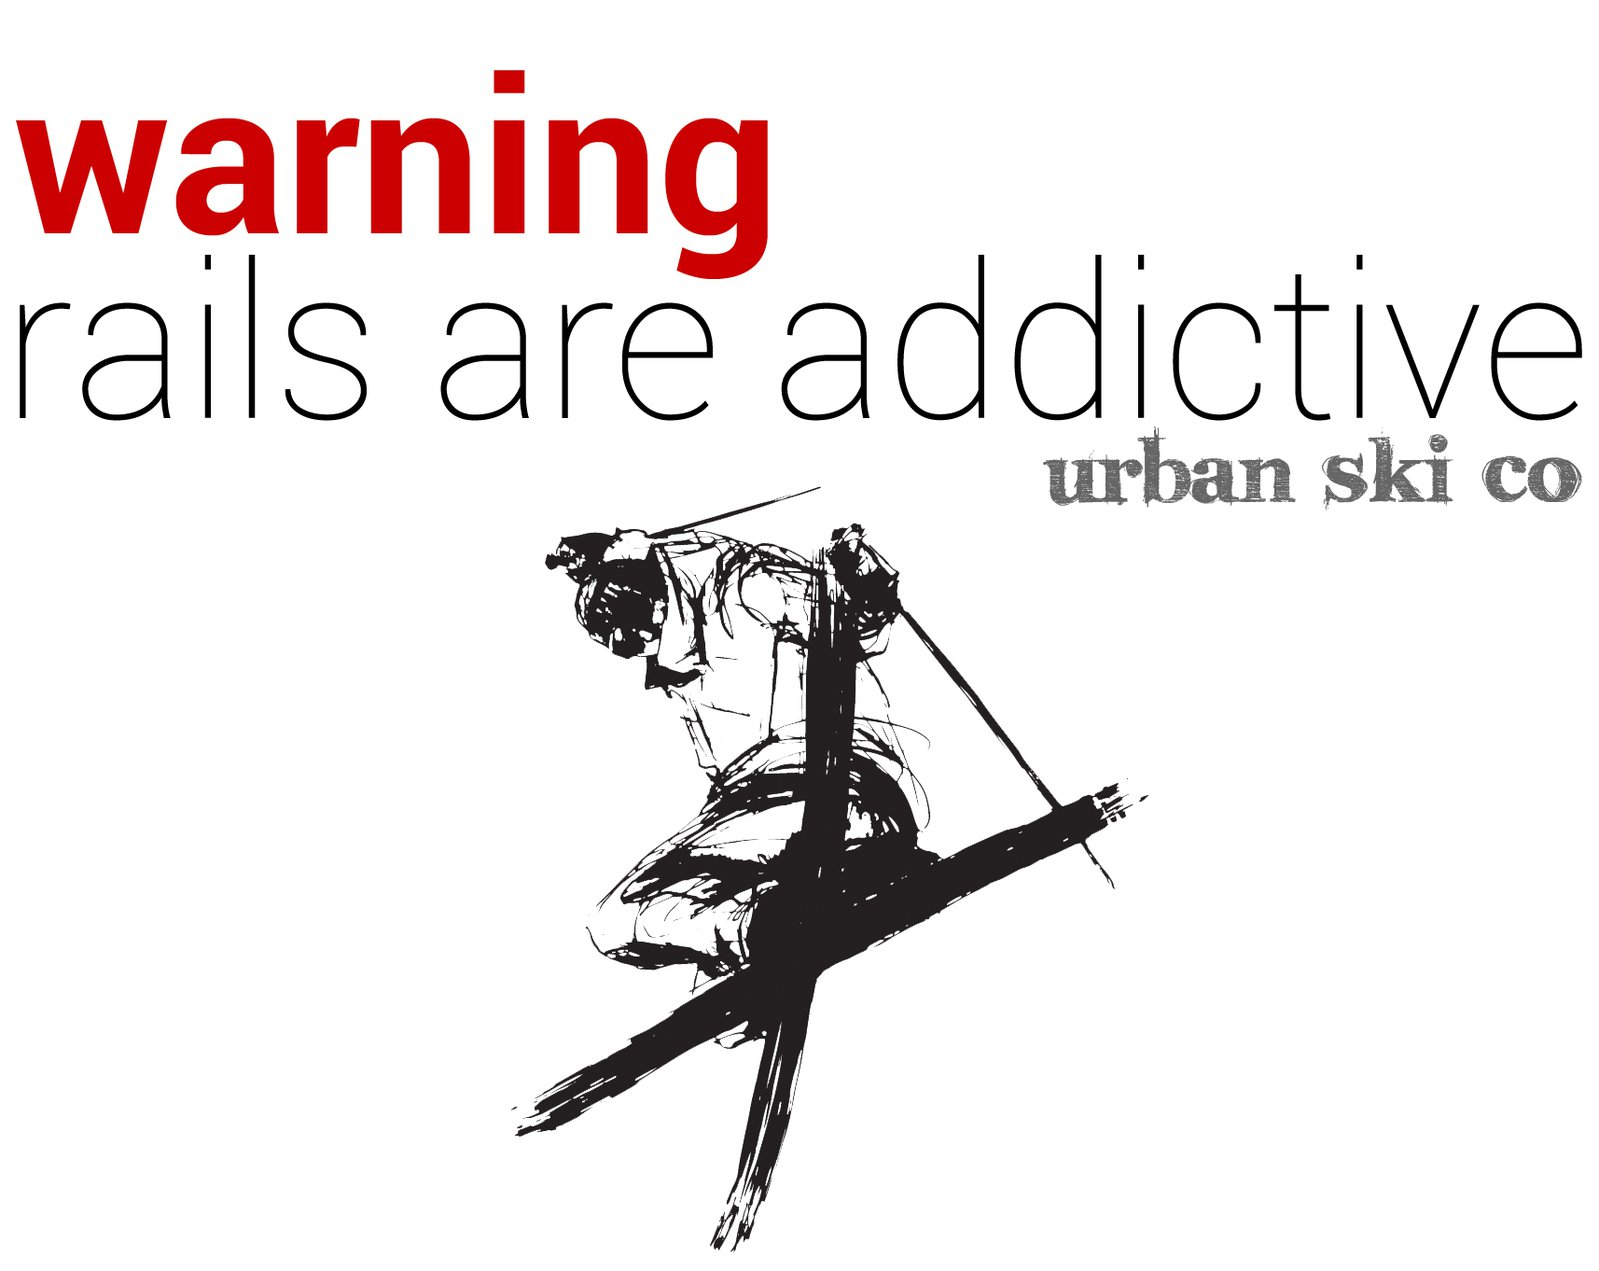 Urban Ski Co - Warning